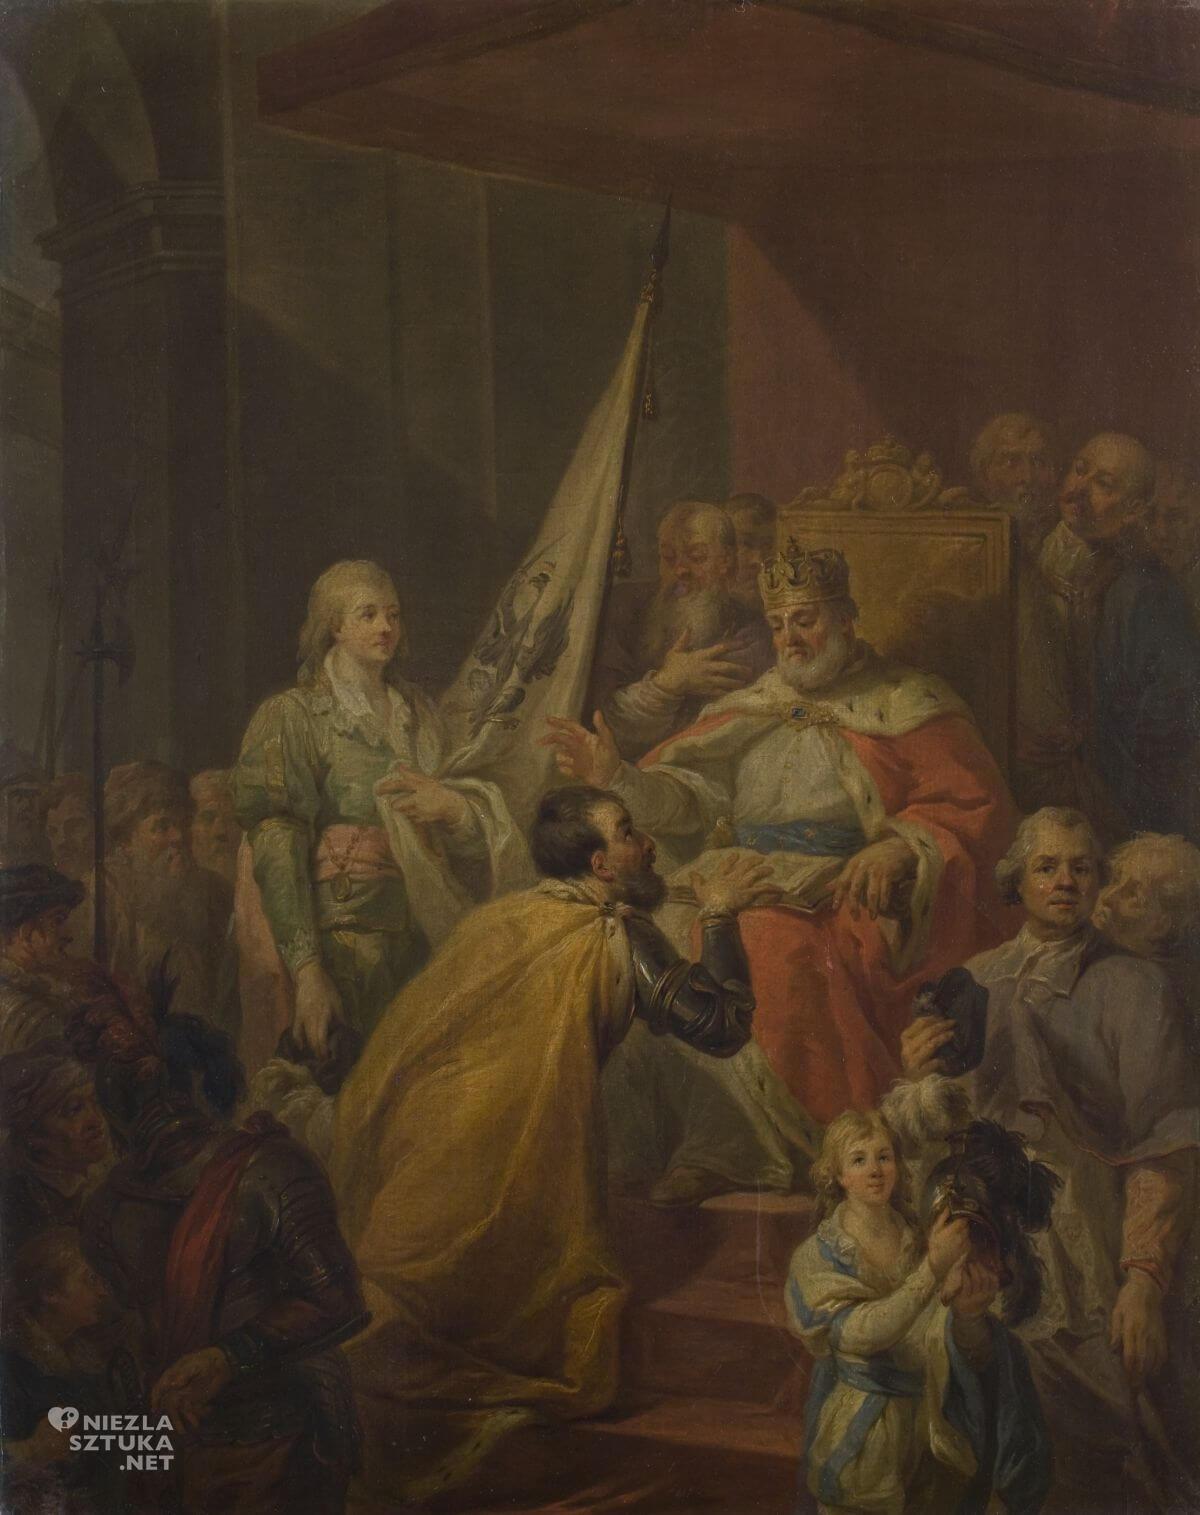 Marcello Bacciarelli, Hołd pruski, Niezła sztuka